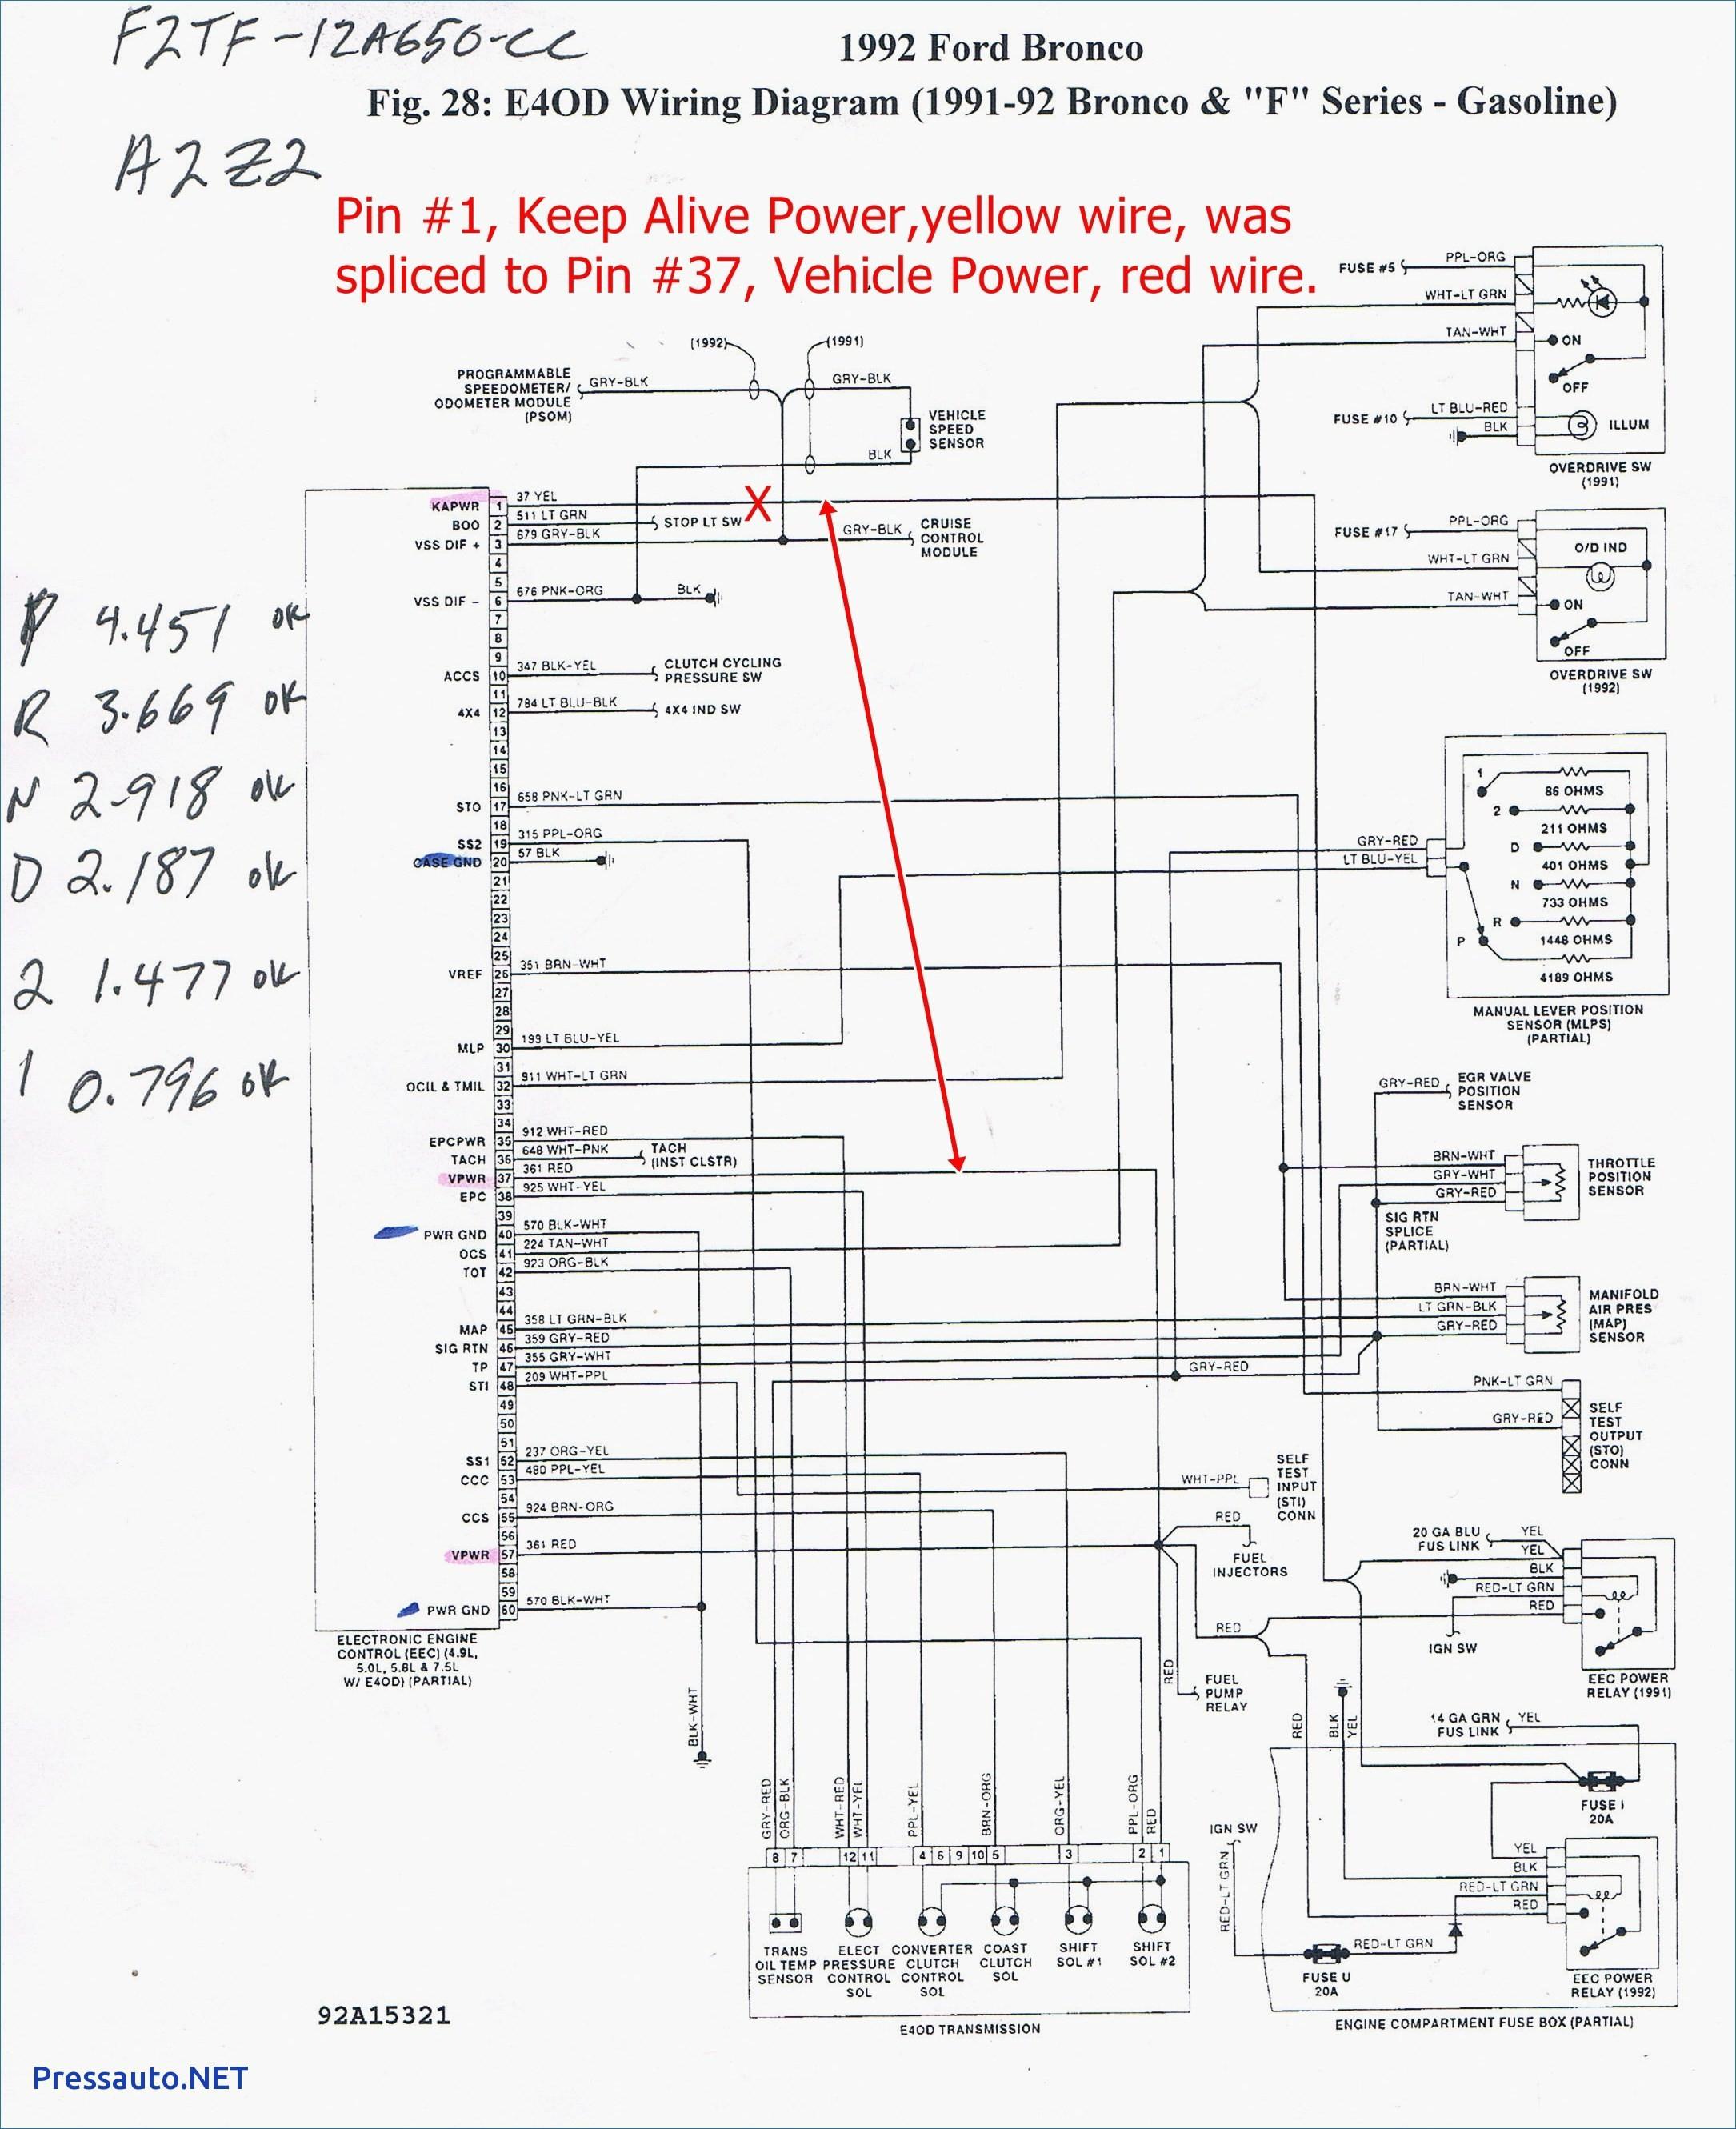 Dodge Ram 1500 Wiring Harness | Wiring Diagram - Dodge Ram Wiring Harness Diagram